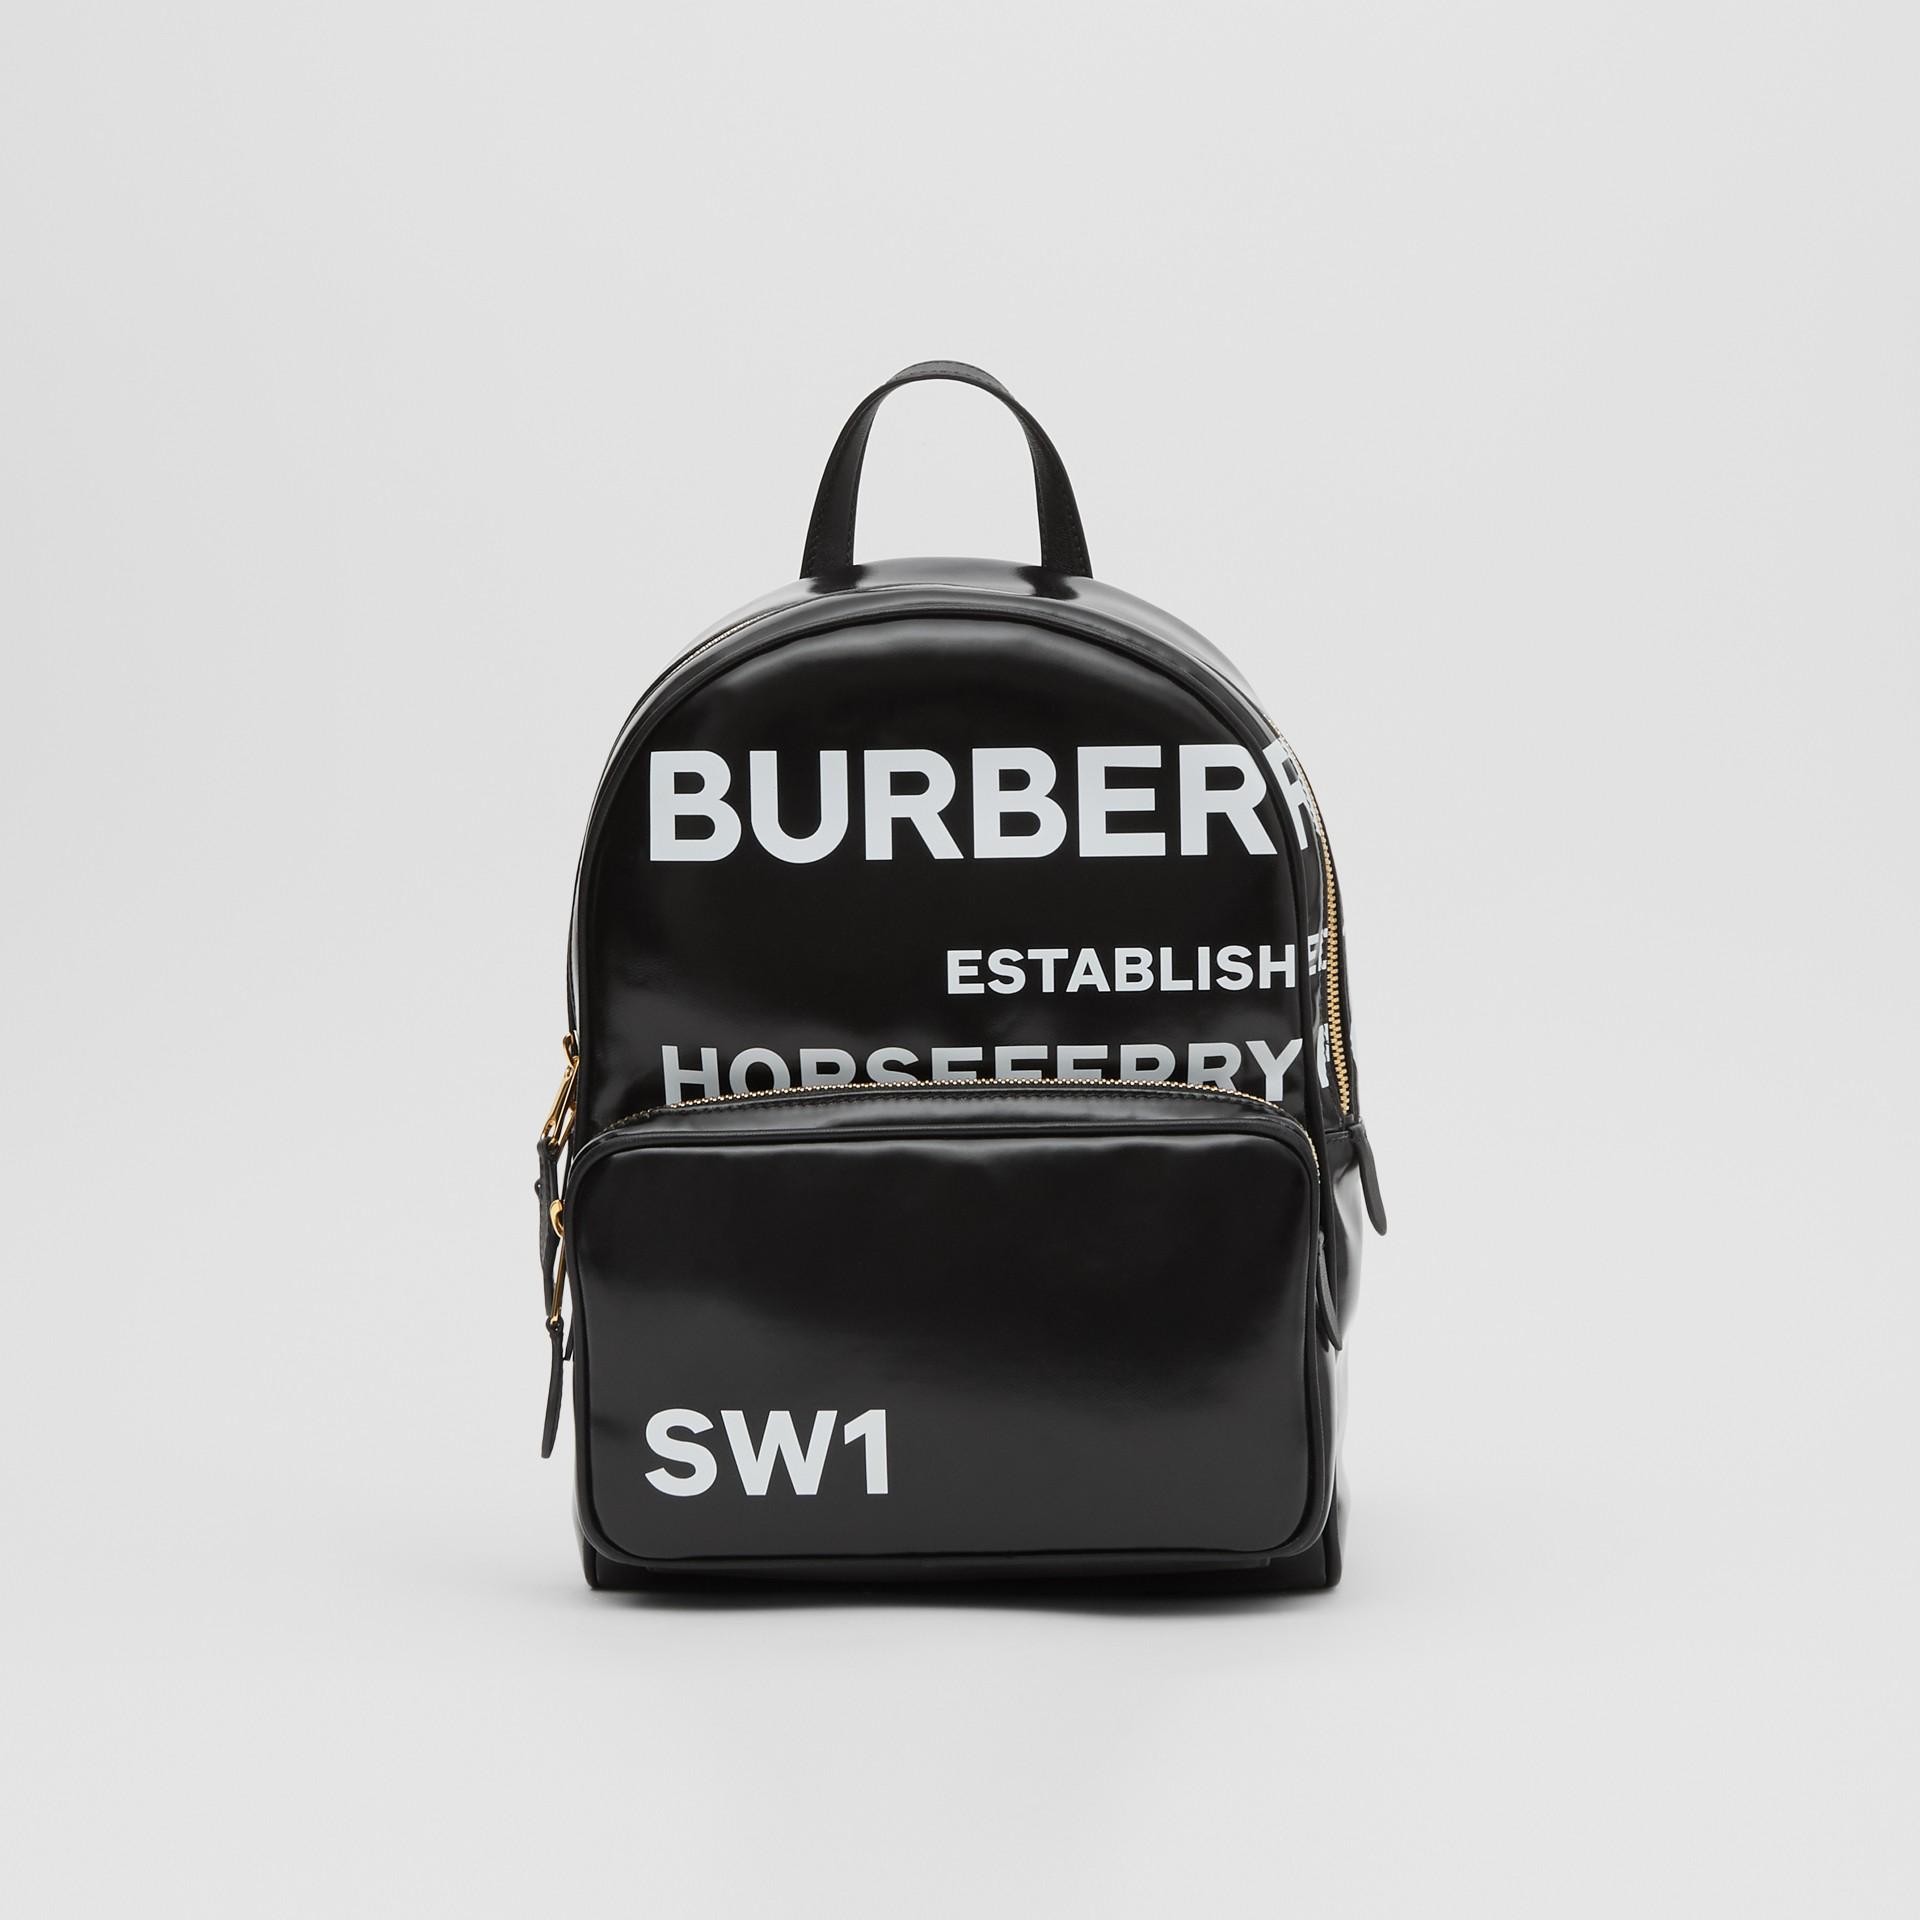 Horseferry 印花塗層帆布後背包 (黑色) | Burberry - 圖庫照片 0